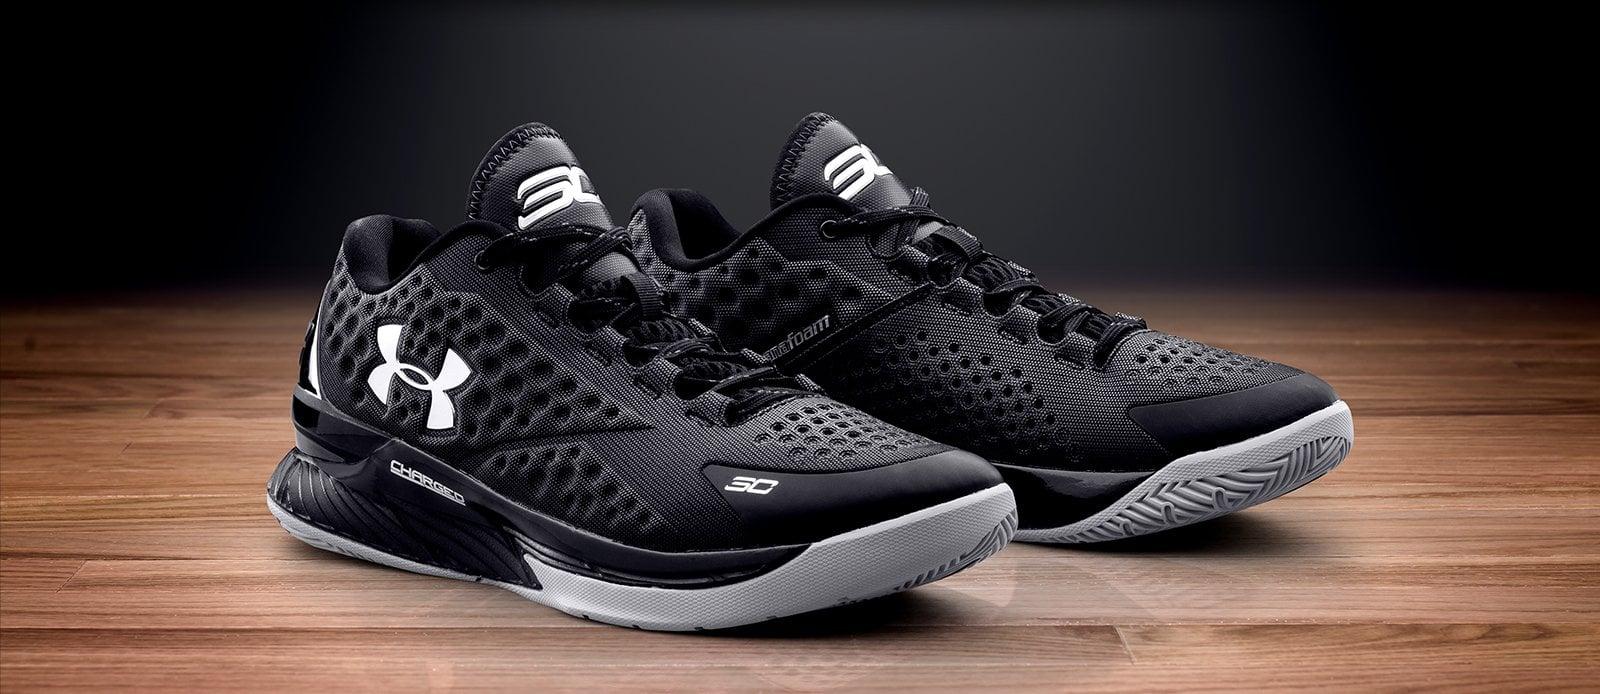 Stephen Curry Shoes Footlocker Uk